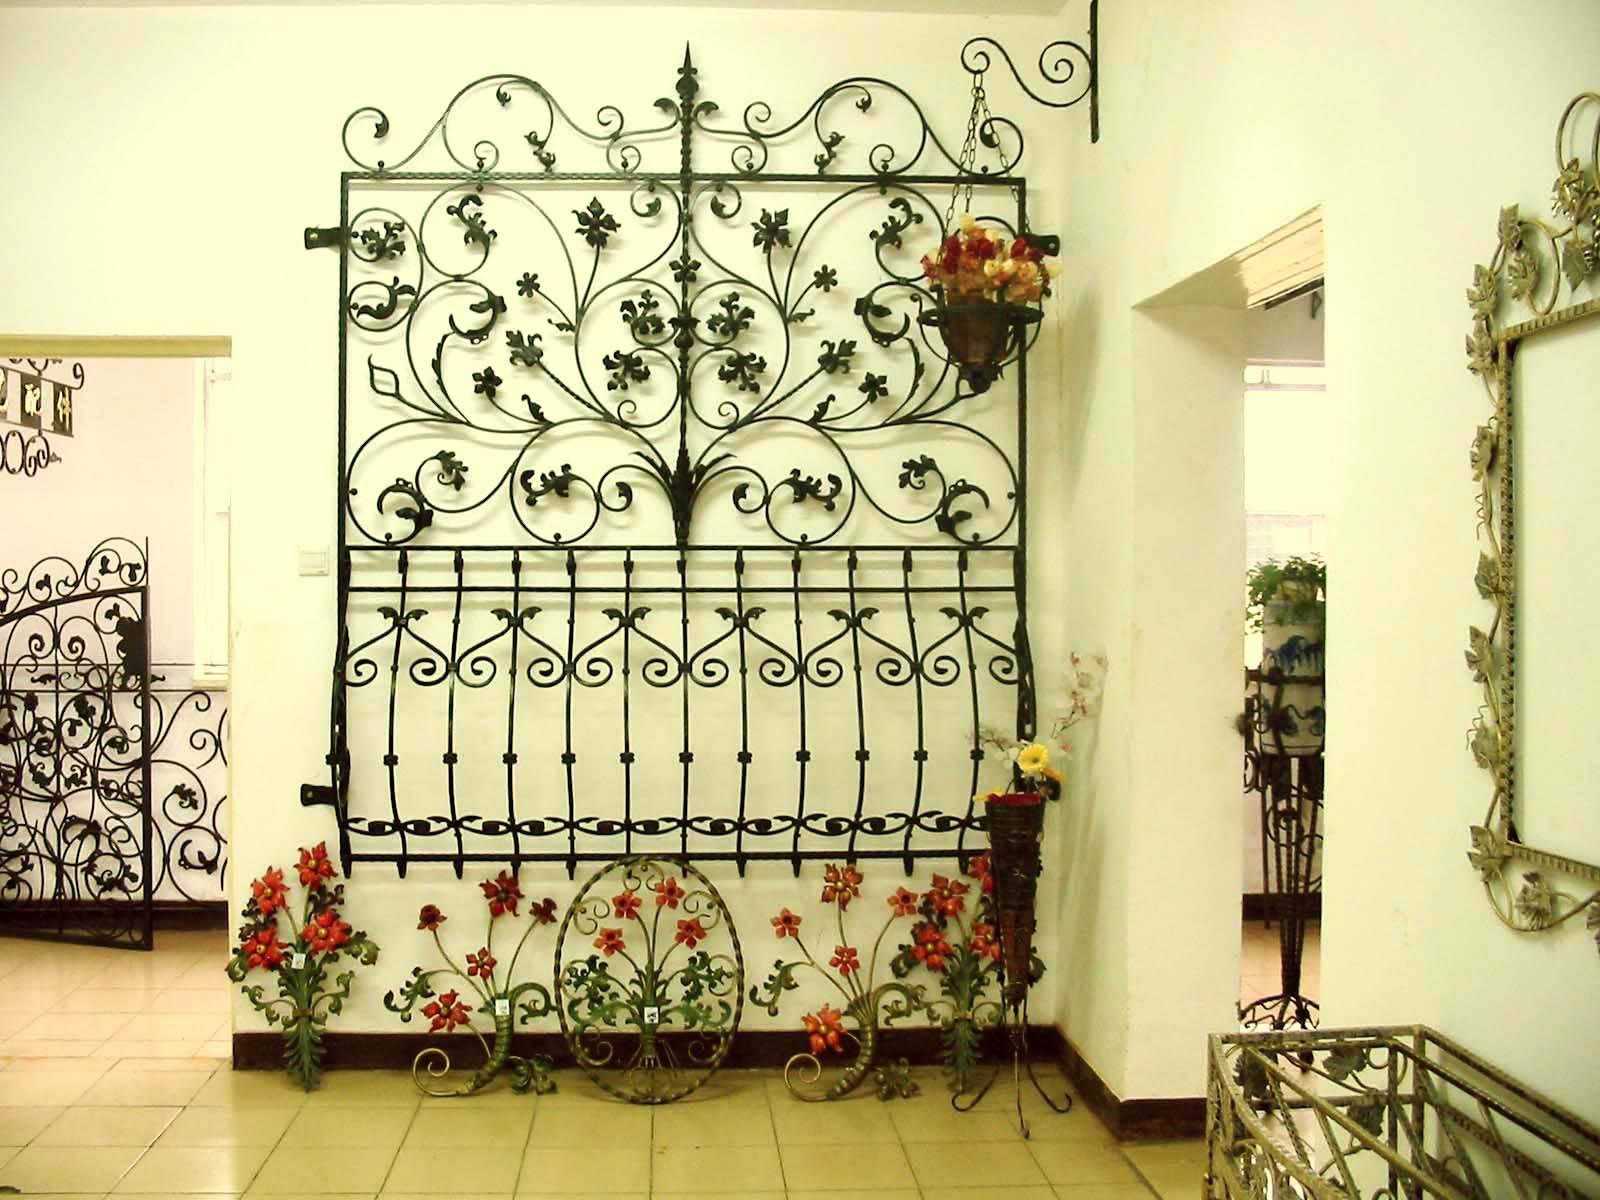 Wrought iron safty window iron home decor shijiazhuang for Iron home decor